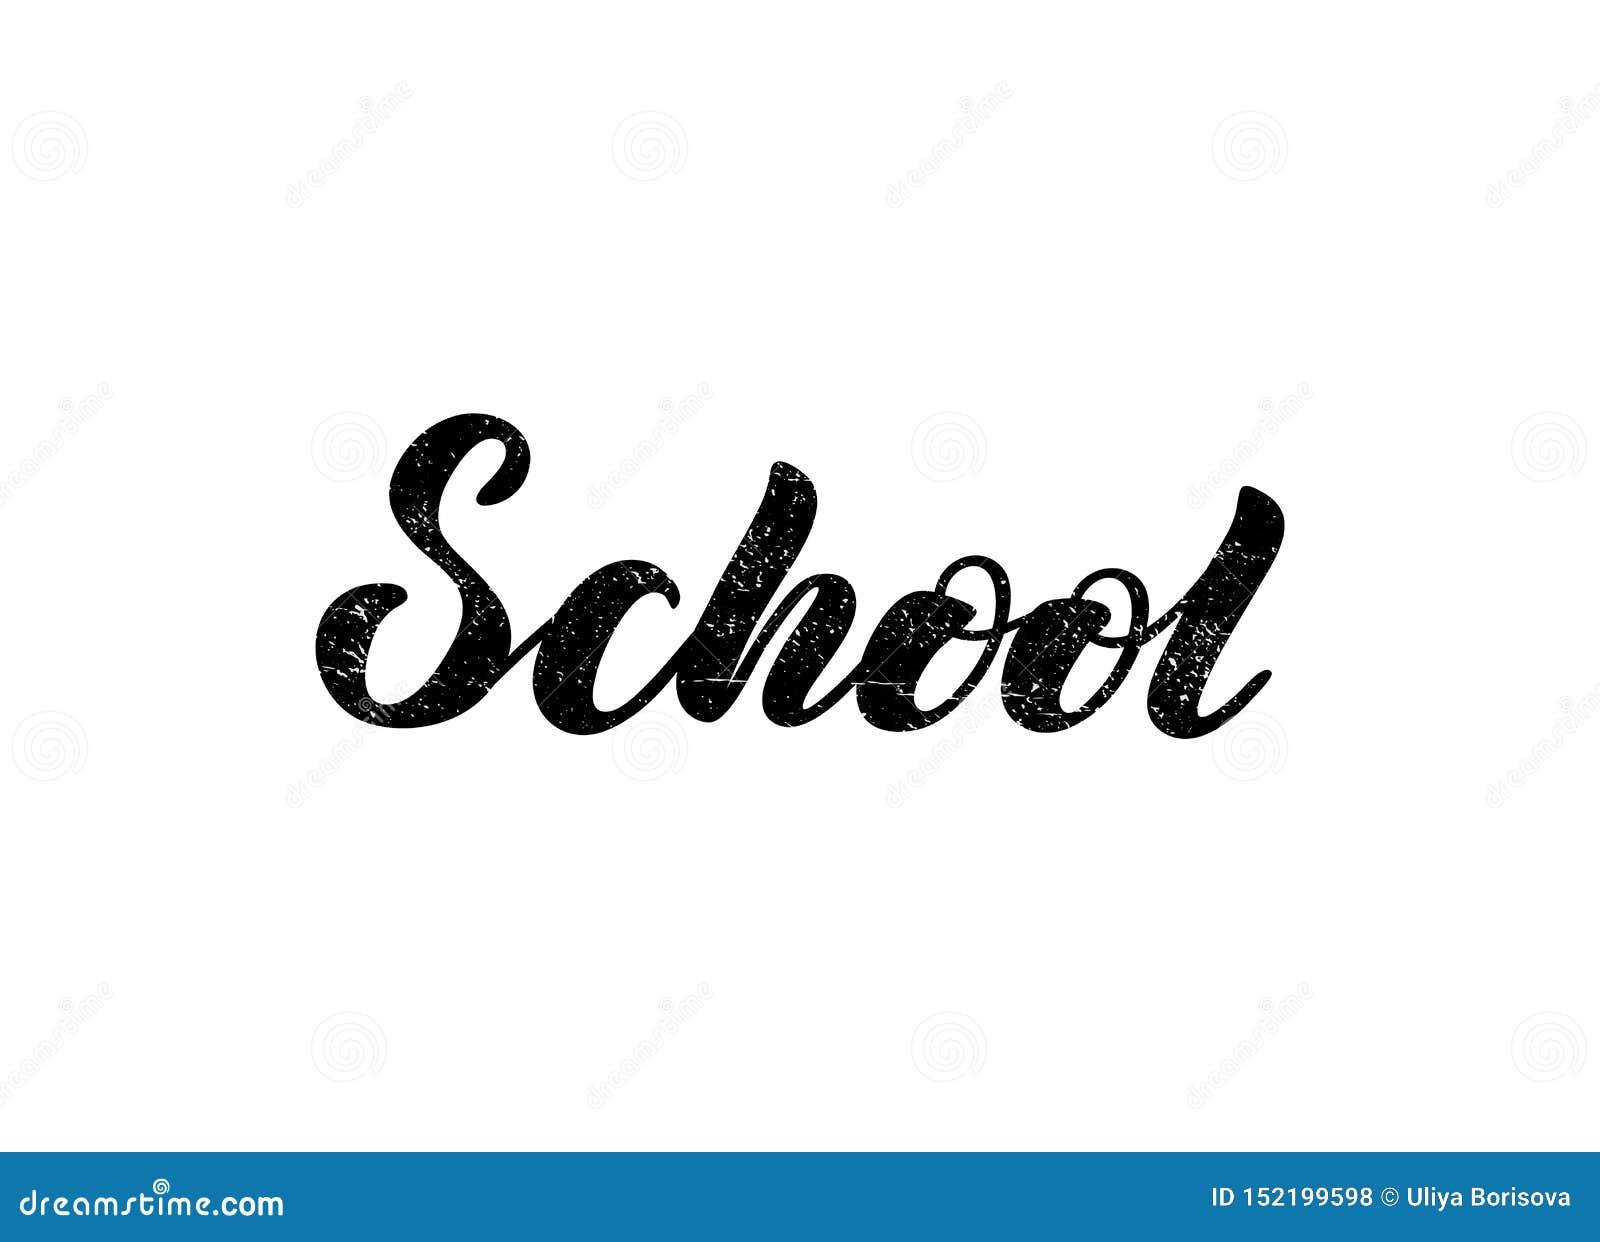 Vector illustration with handwritten phrase - School. Lettering.